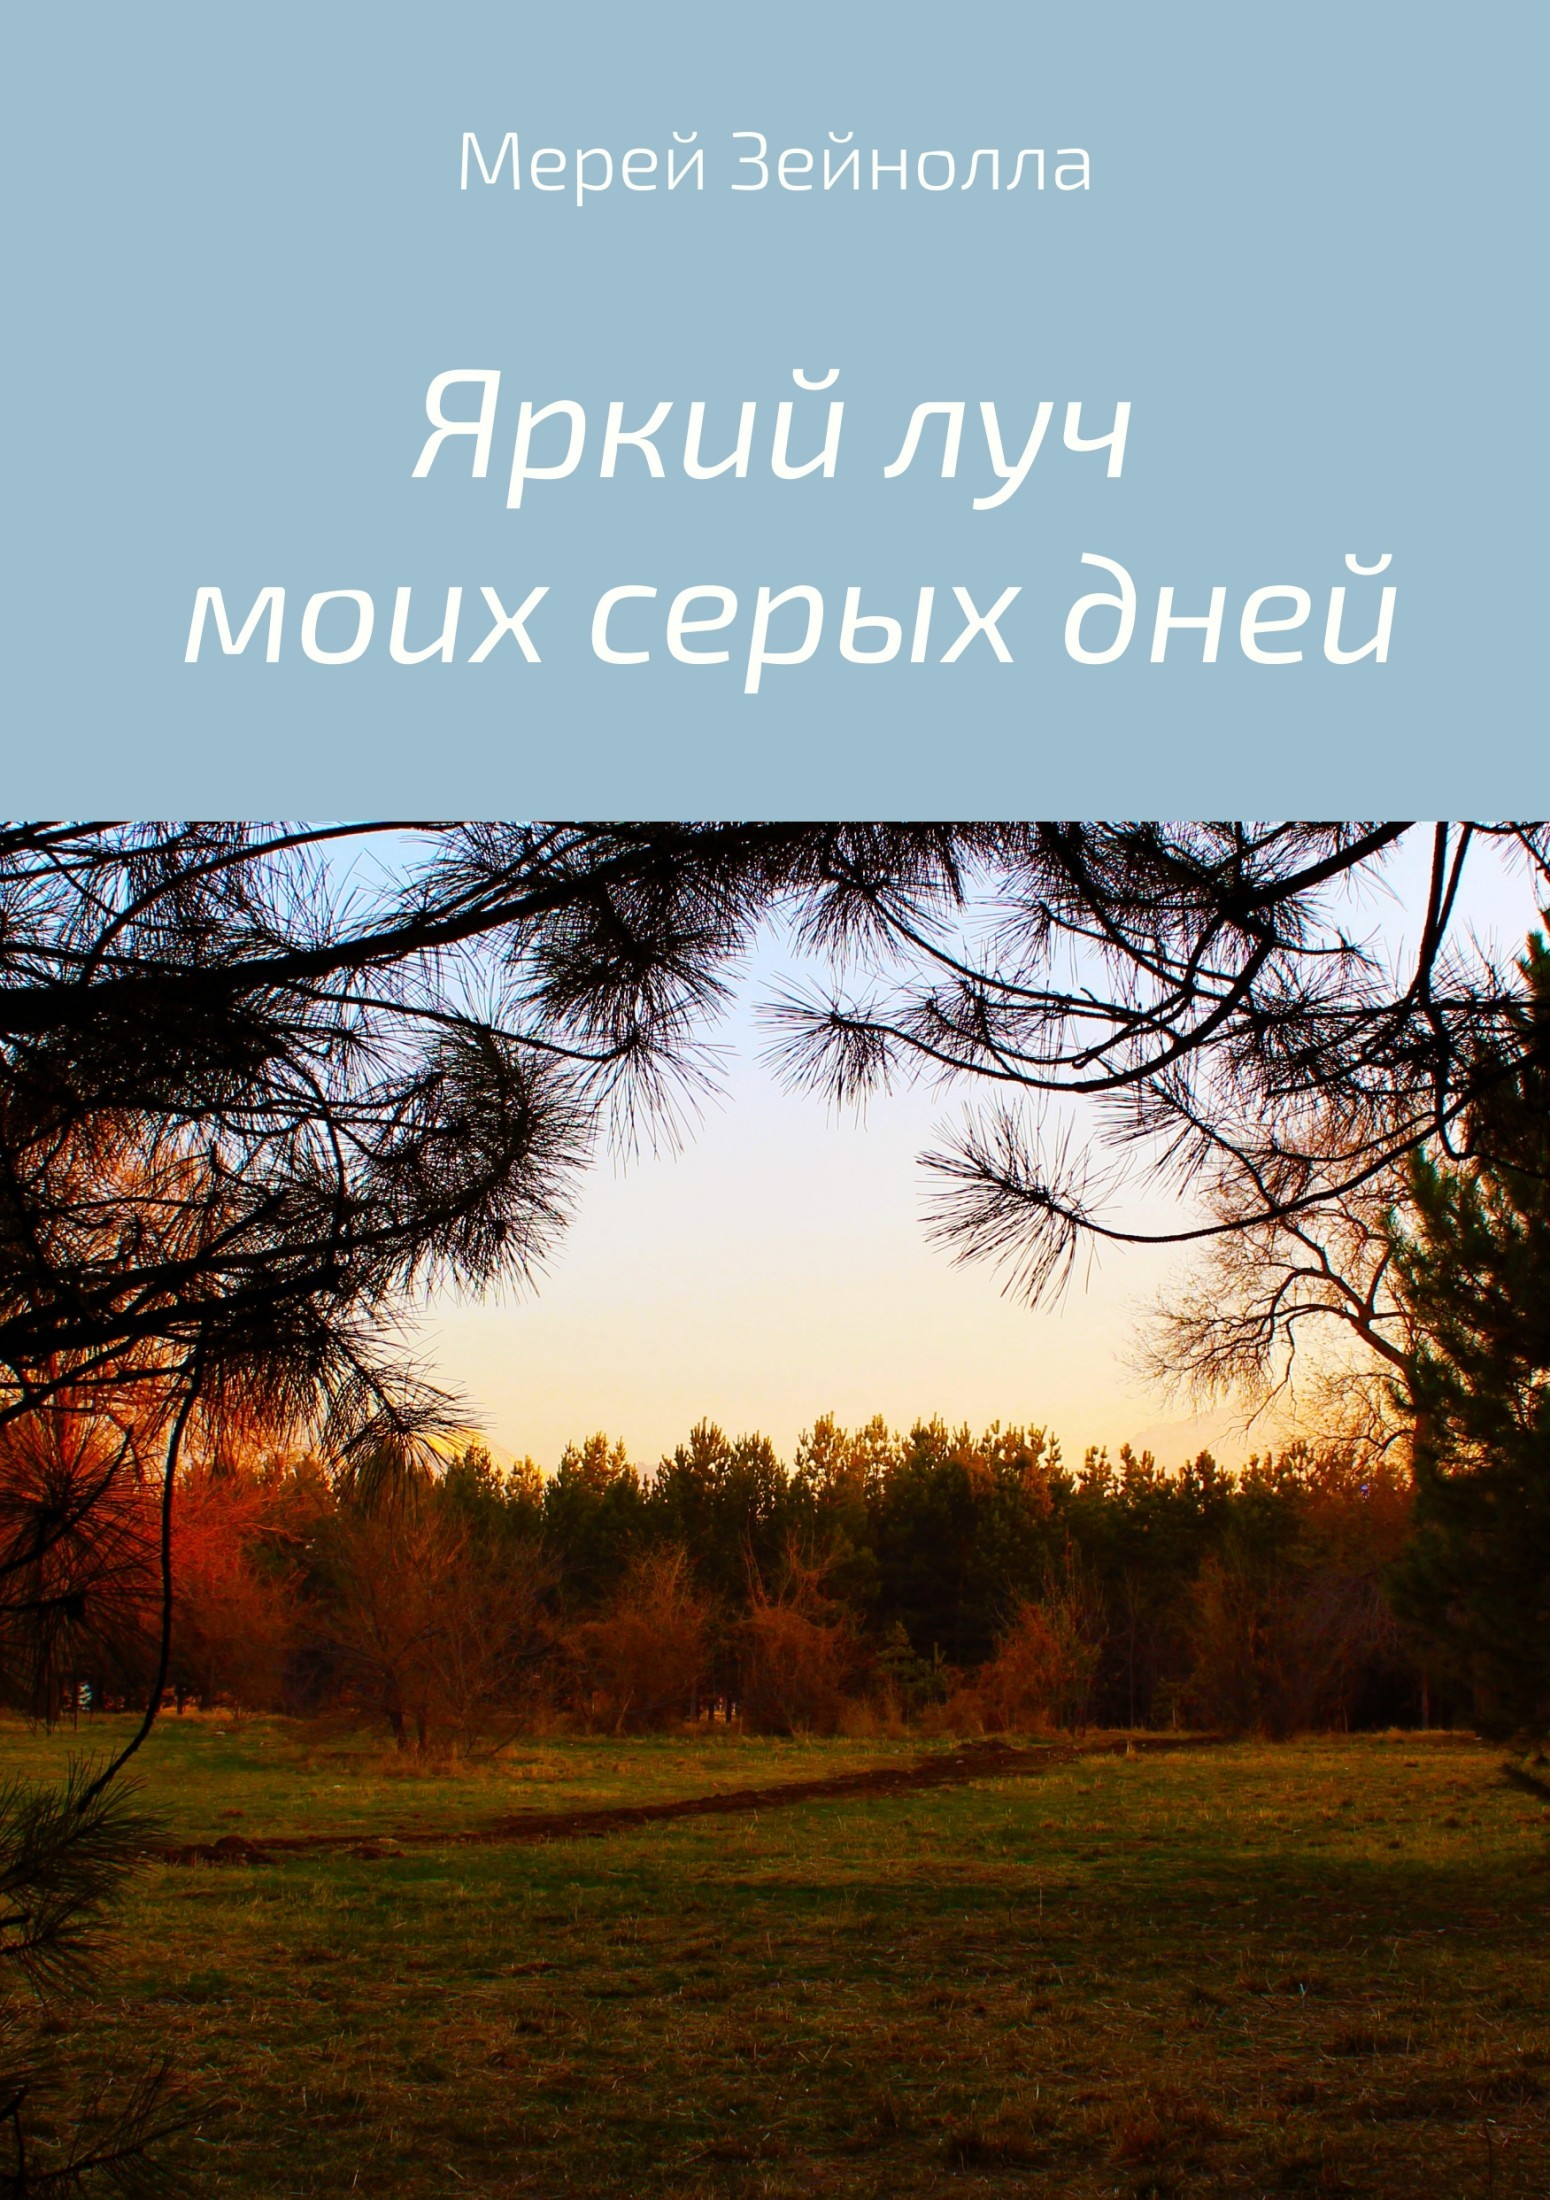 Мерей Болатовна Зейнолла бесплатно